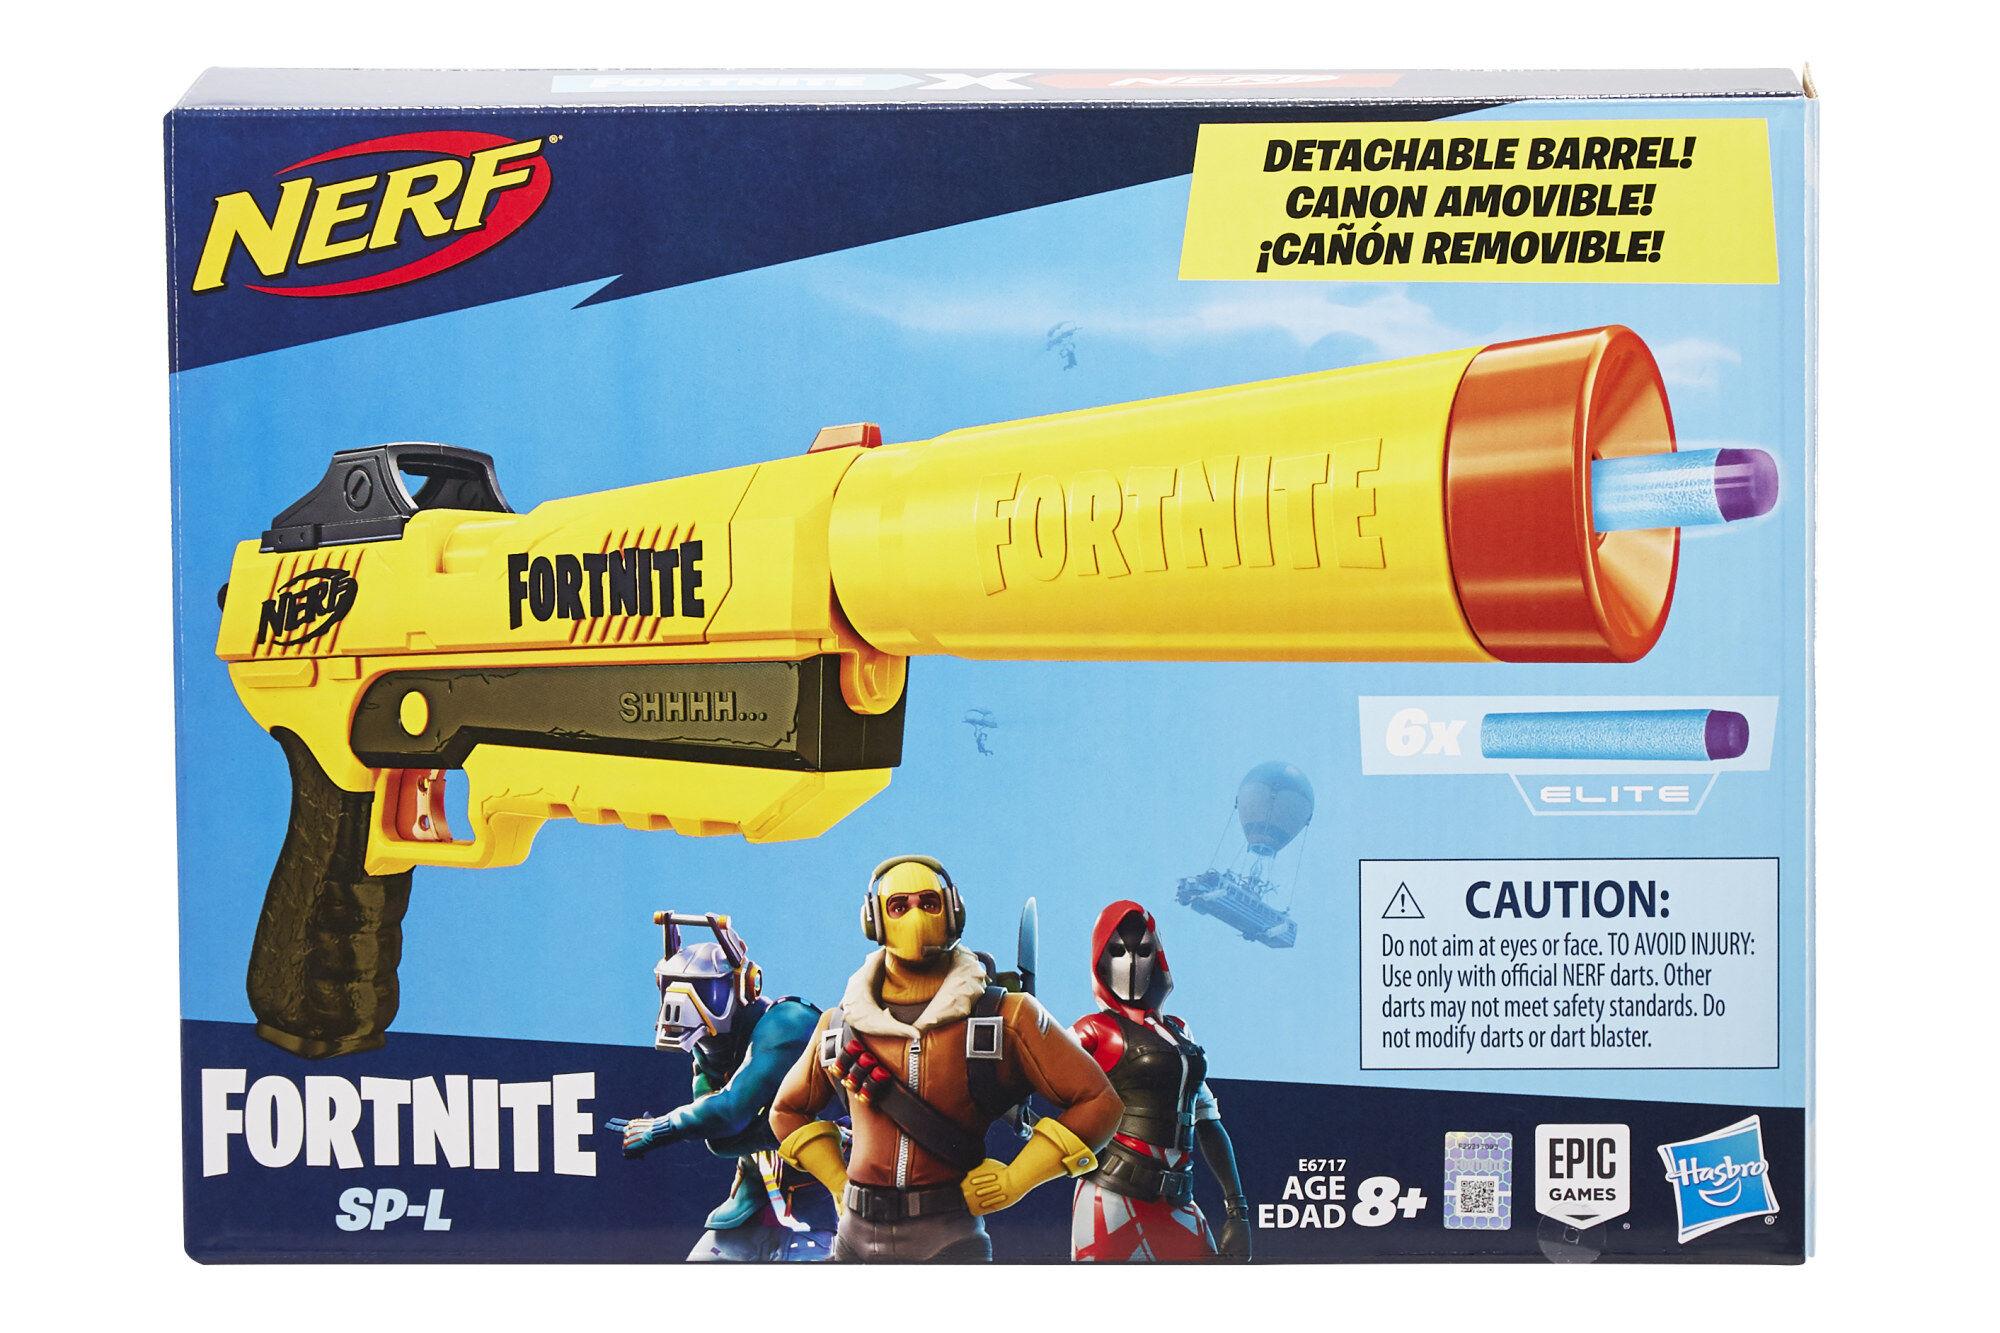 Nerf Fortnite Sneaky Springer SP-L nuolipyssy